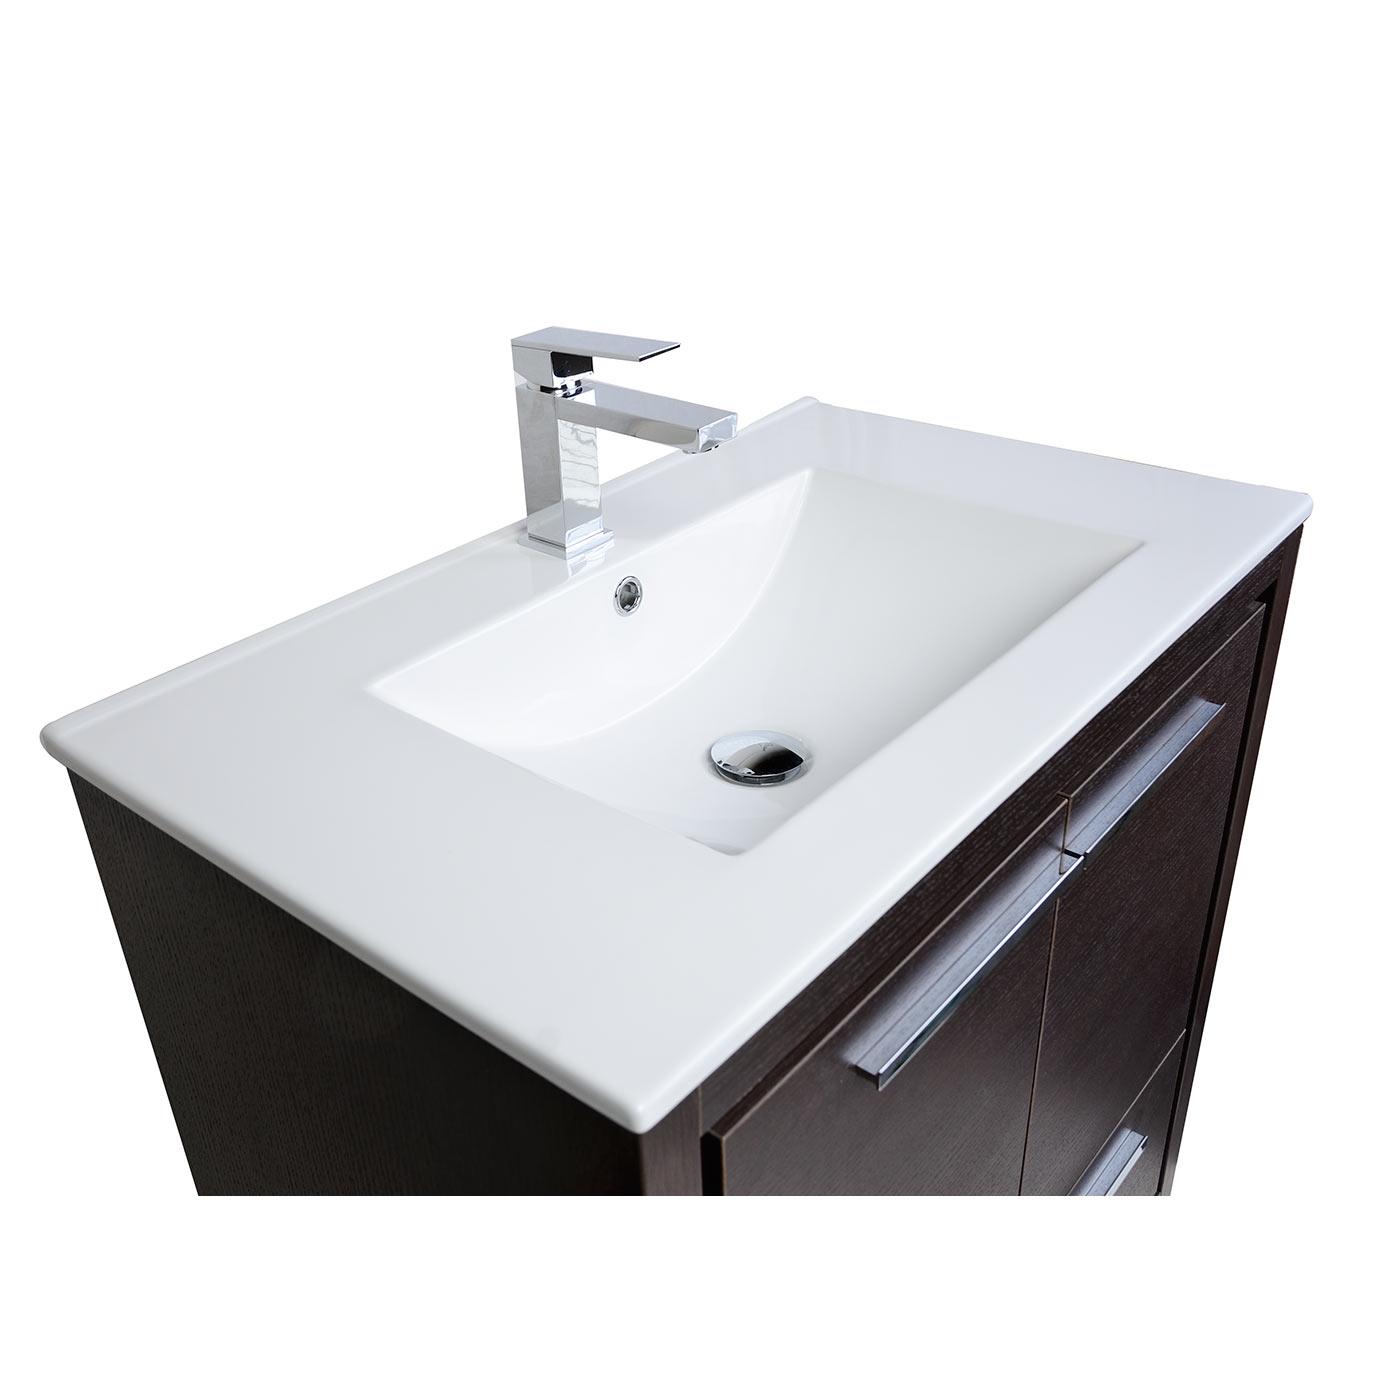 Buy CBI Enna 29 5 inch Espresso Modern Bathroom Vanity TN LA750 WG on ConcepB